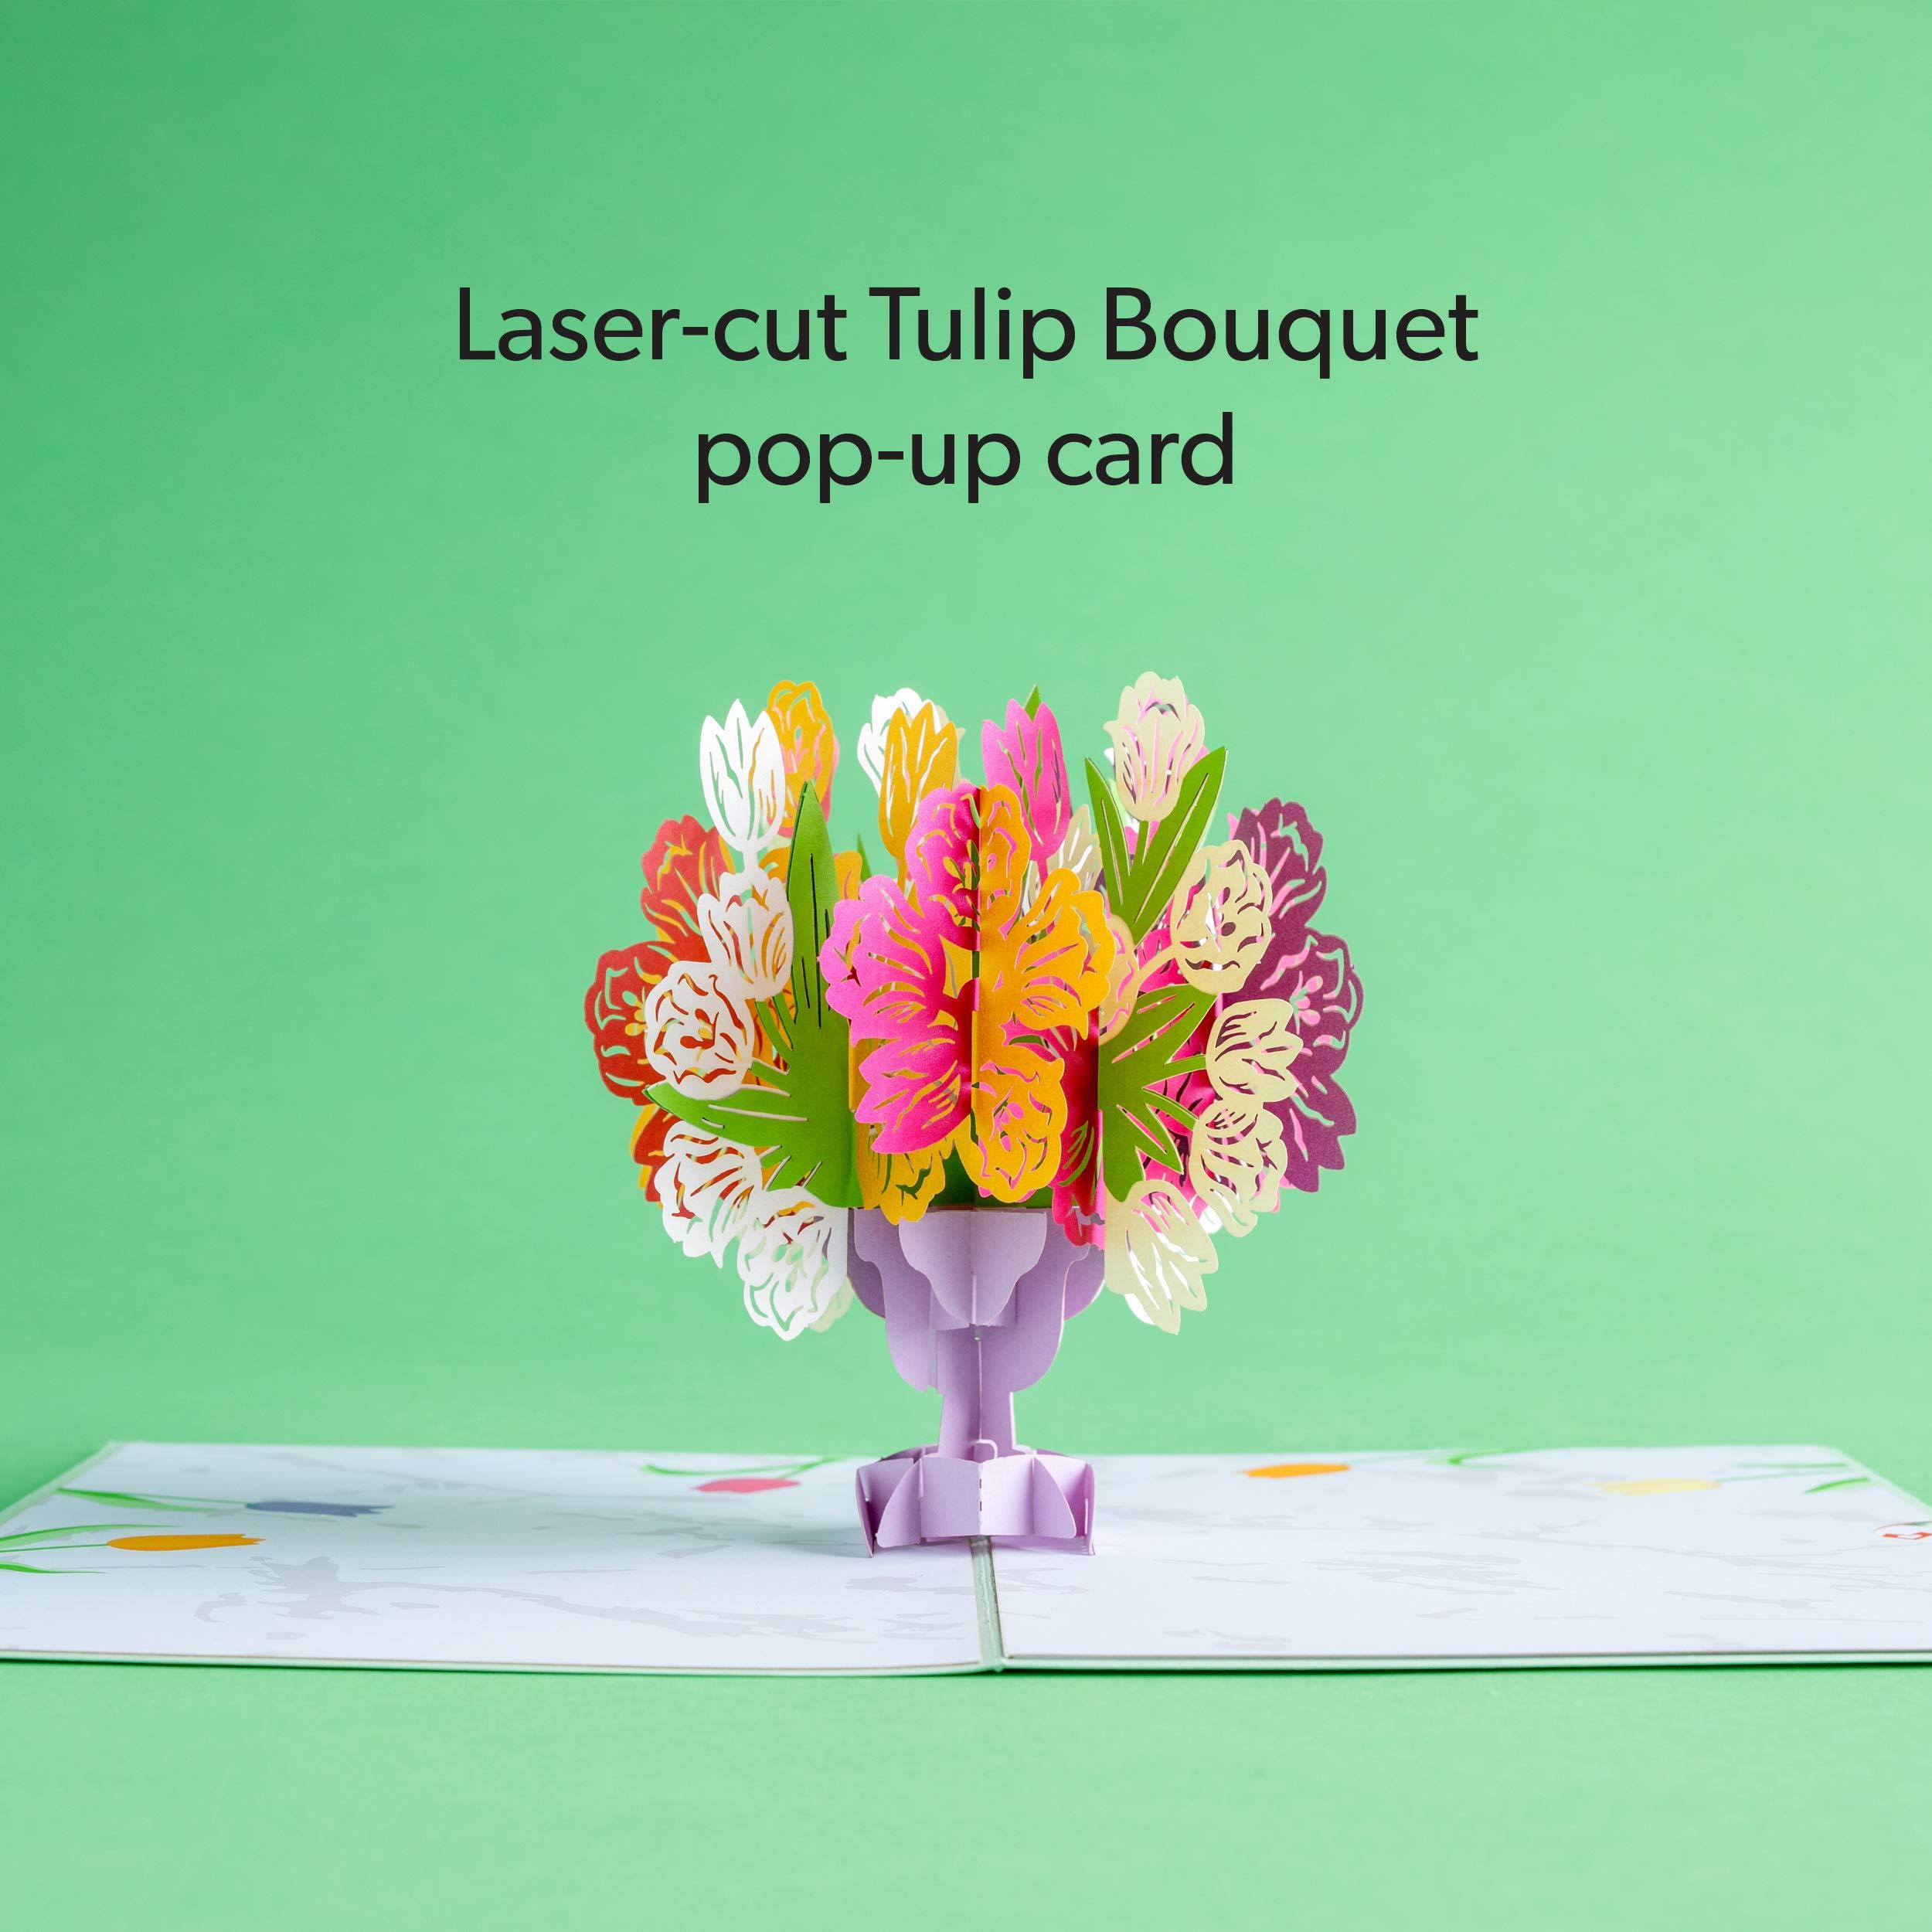 Lovepop Tulip Bouquet Pop Up Greeting Card, Flower Pop Up Card, Lovepop Card, Anniversary Card, Spring Card, Summer Card, Card for Mom by Lovepop (Image #4)